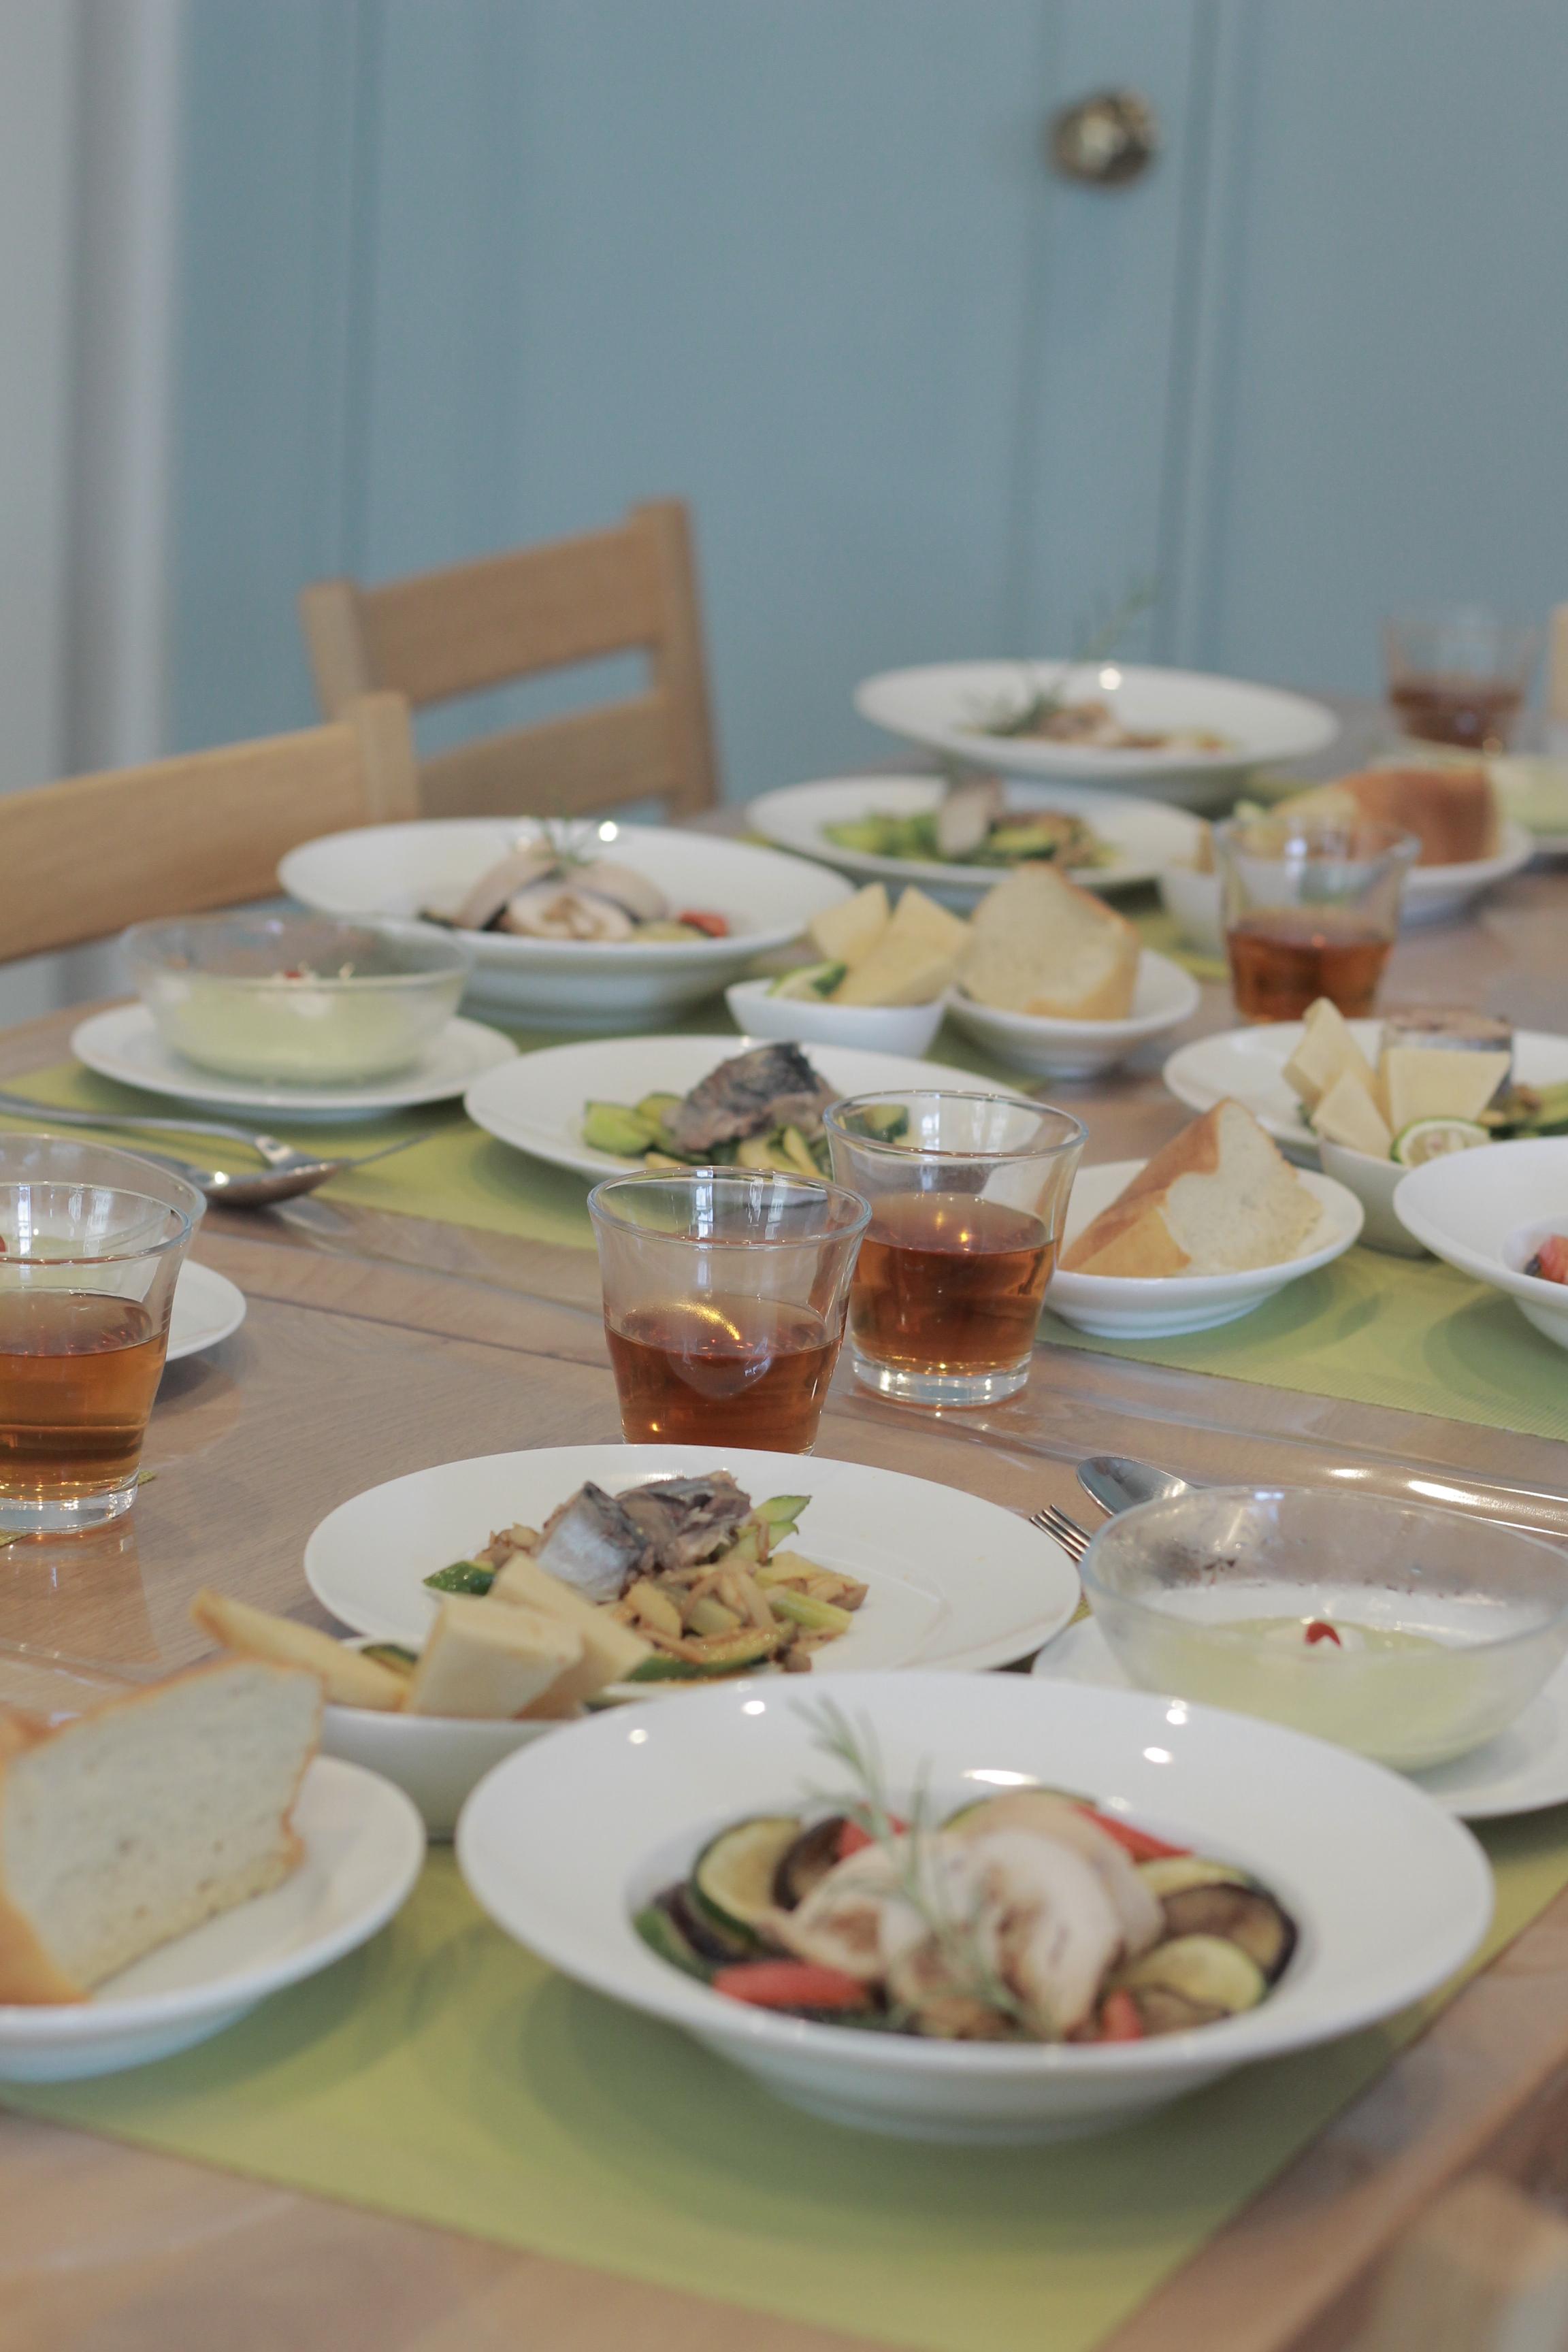 a-ta-sante糖質制限パン料理教室。糖質制限家庭料理教室3日目。